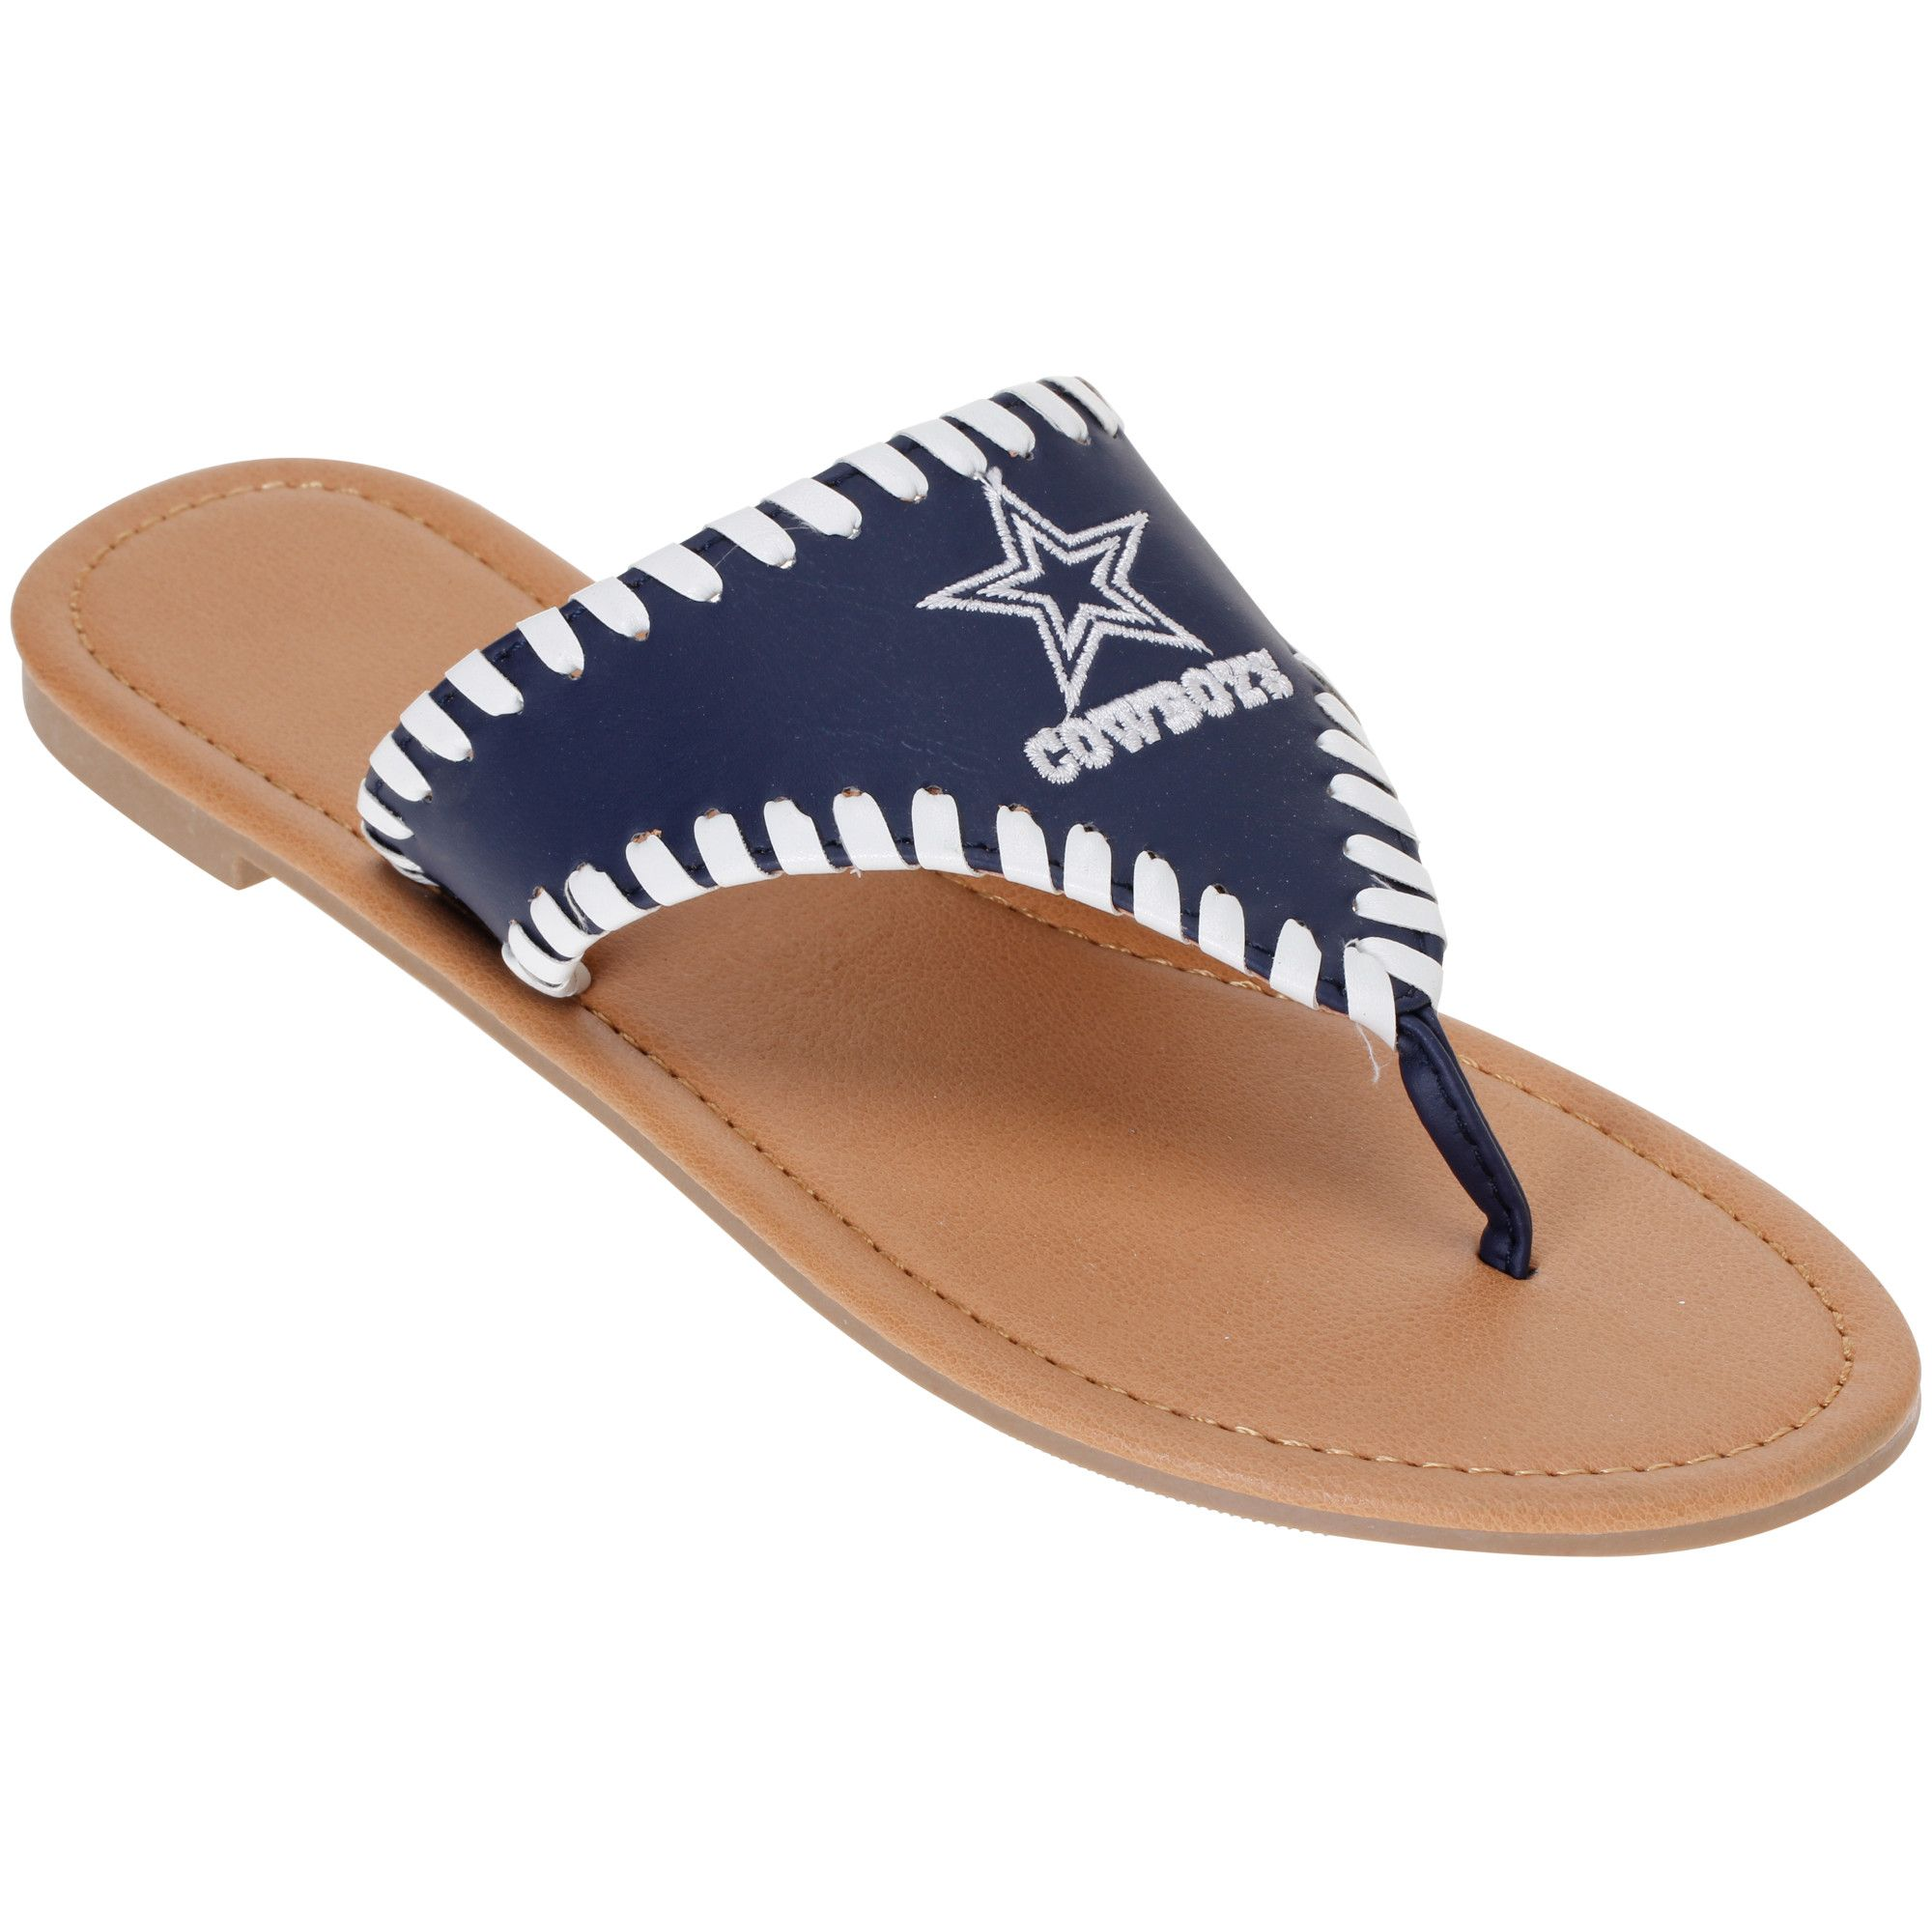 82fdaae2fc628 NFL Dallas Cowboys Women s High End Sandals